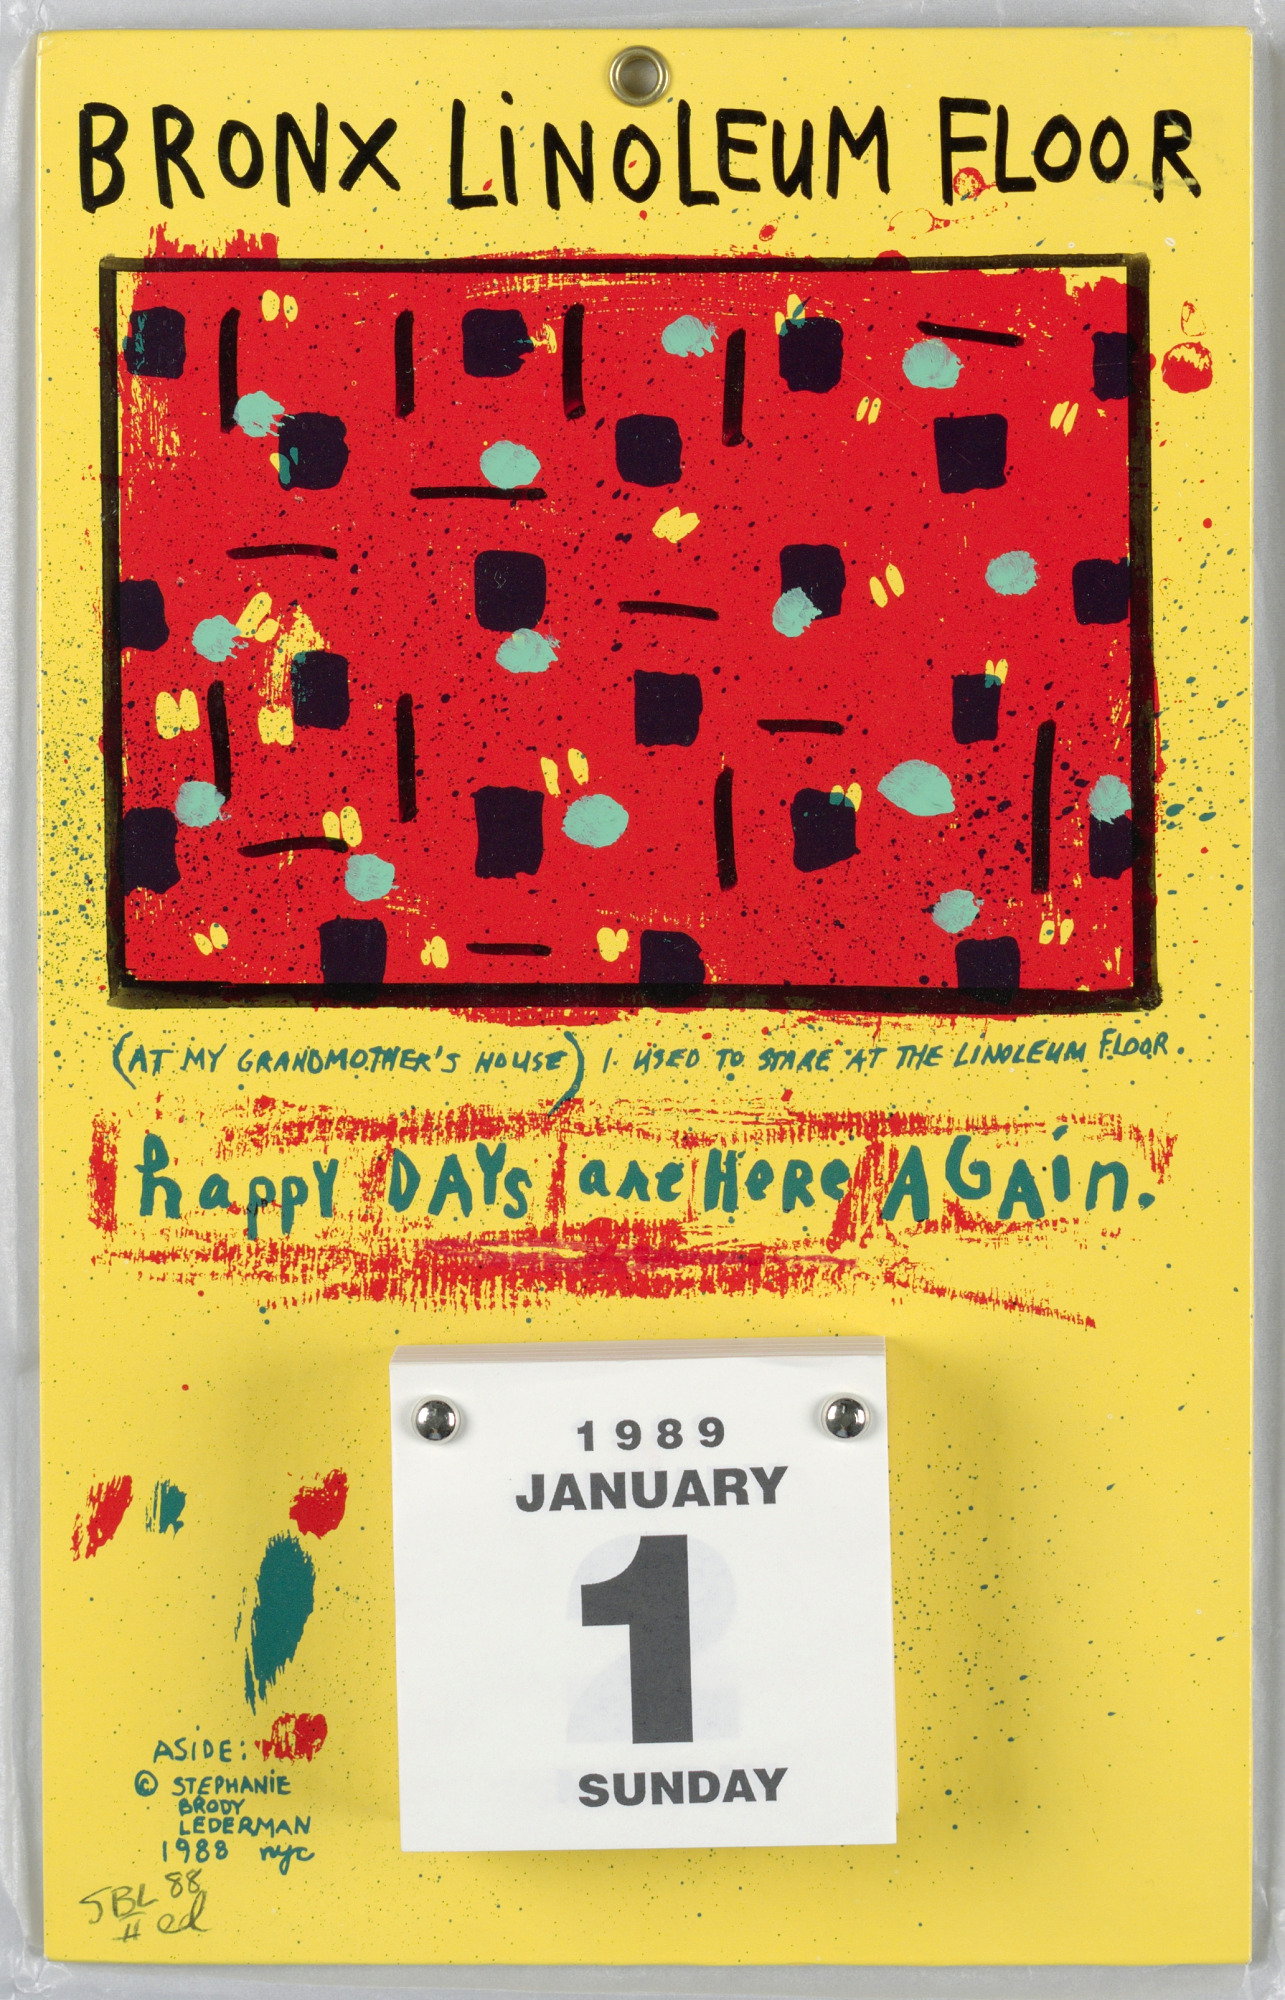 images for Bronx Linoleum Floor